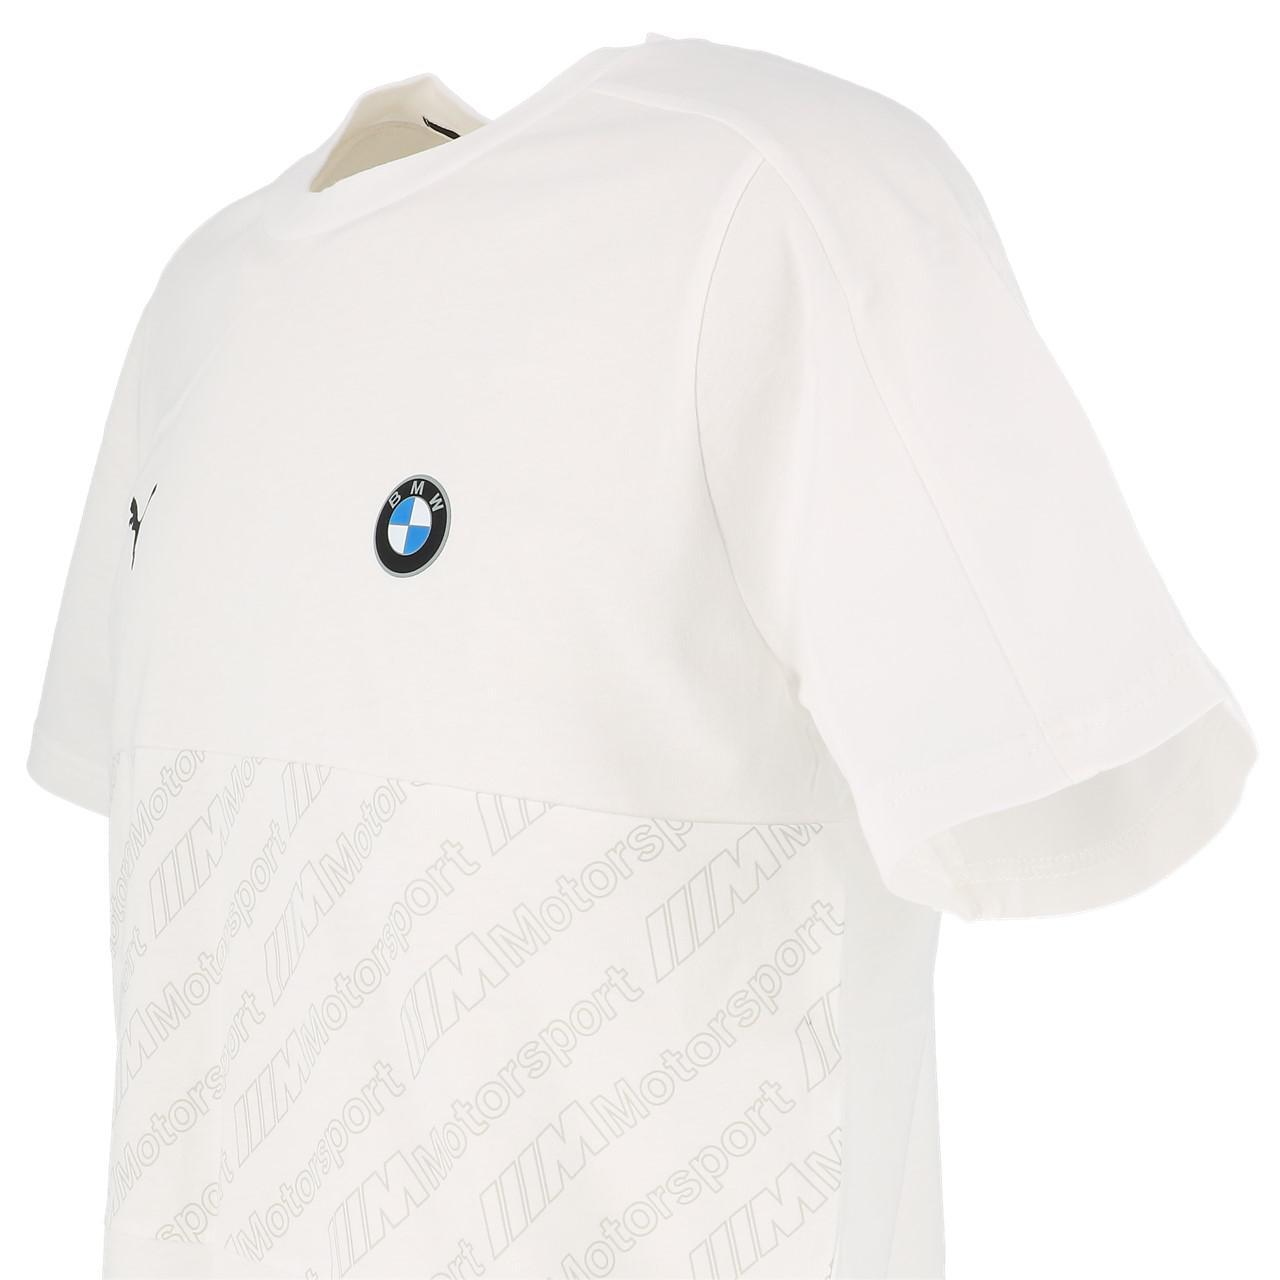 Short-Puma-BMW-Mms-t7-Wht-Mc-Tee-White-30124-New thumbnail 3